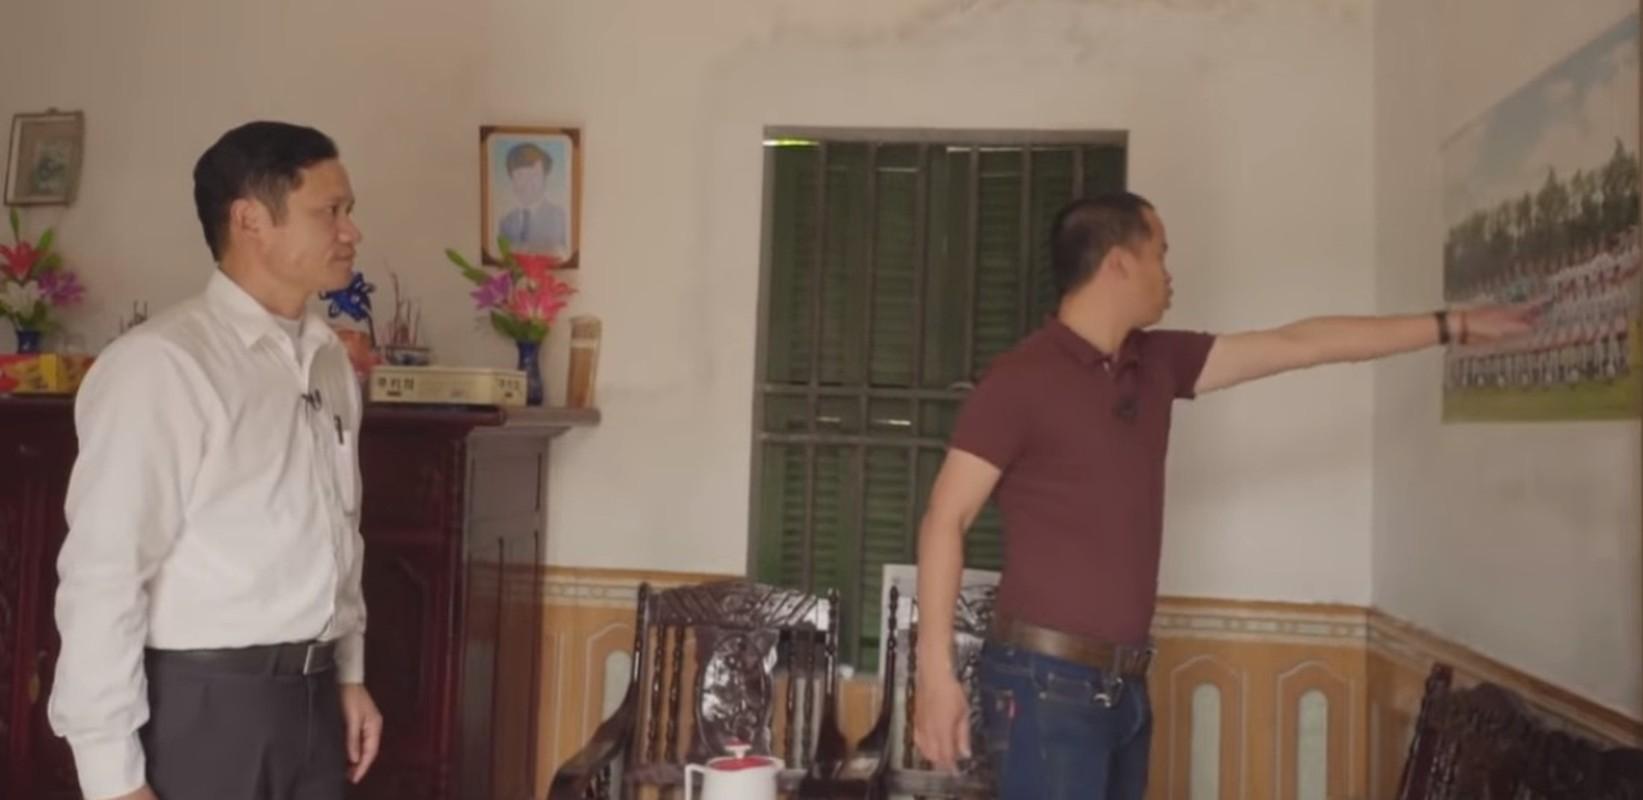 Tham ngoi nha day ky vat cua tien ve Minh Vuong tai Thai Binh-Hinh-8